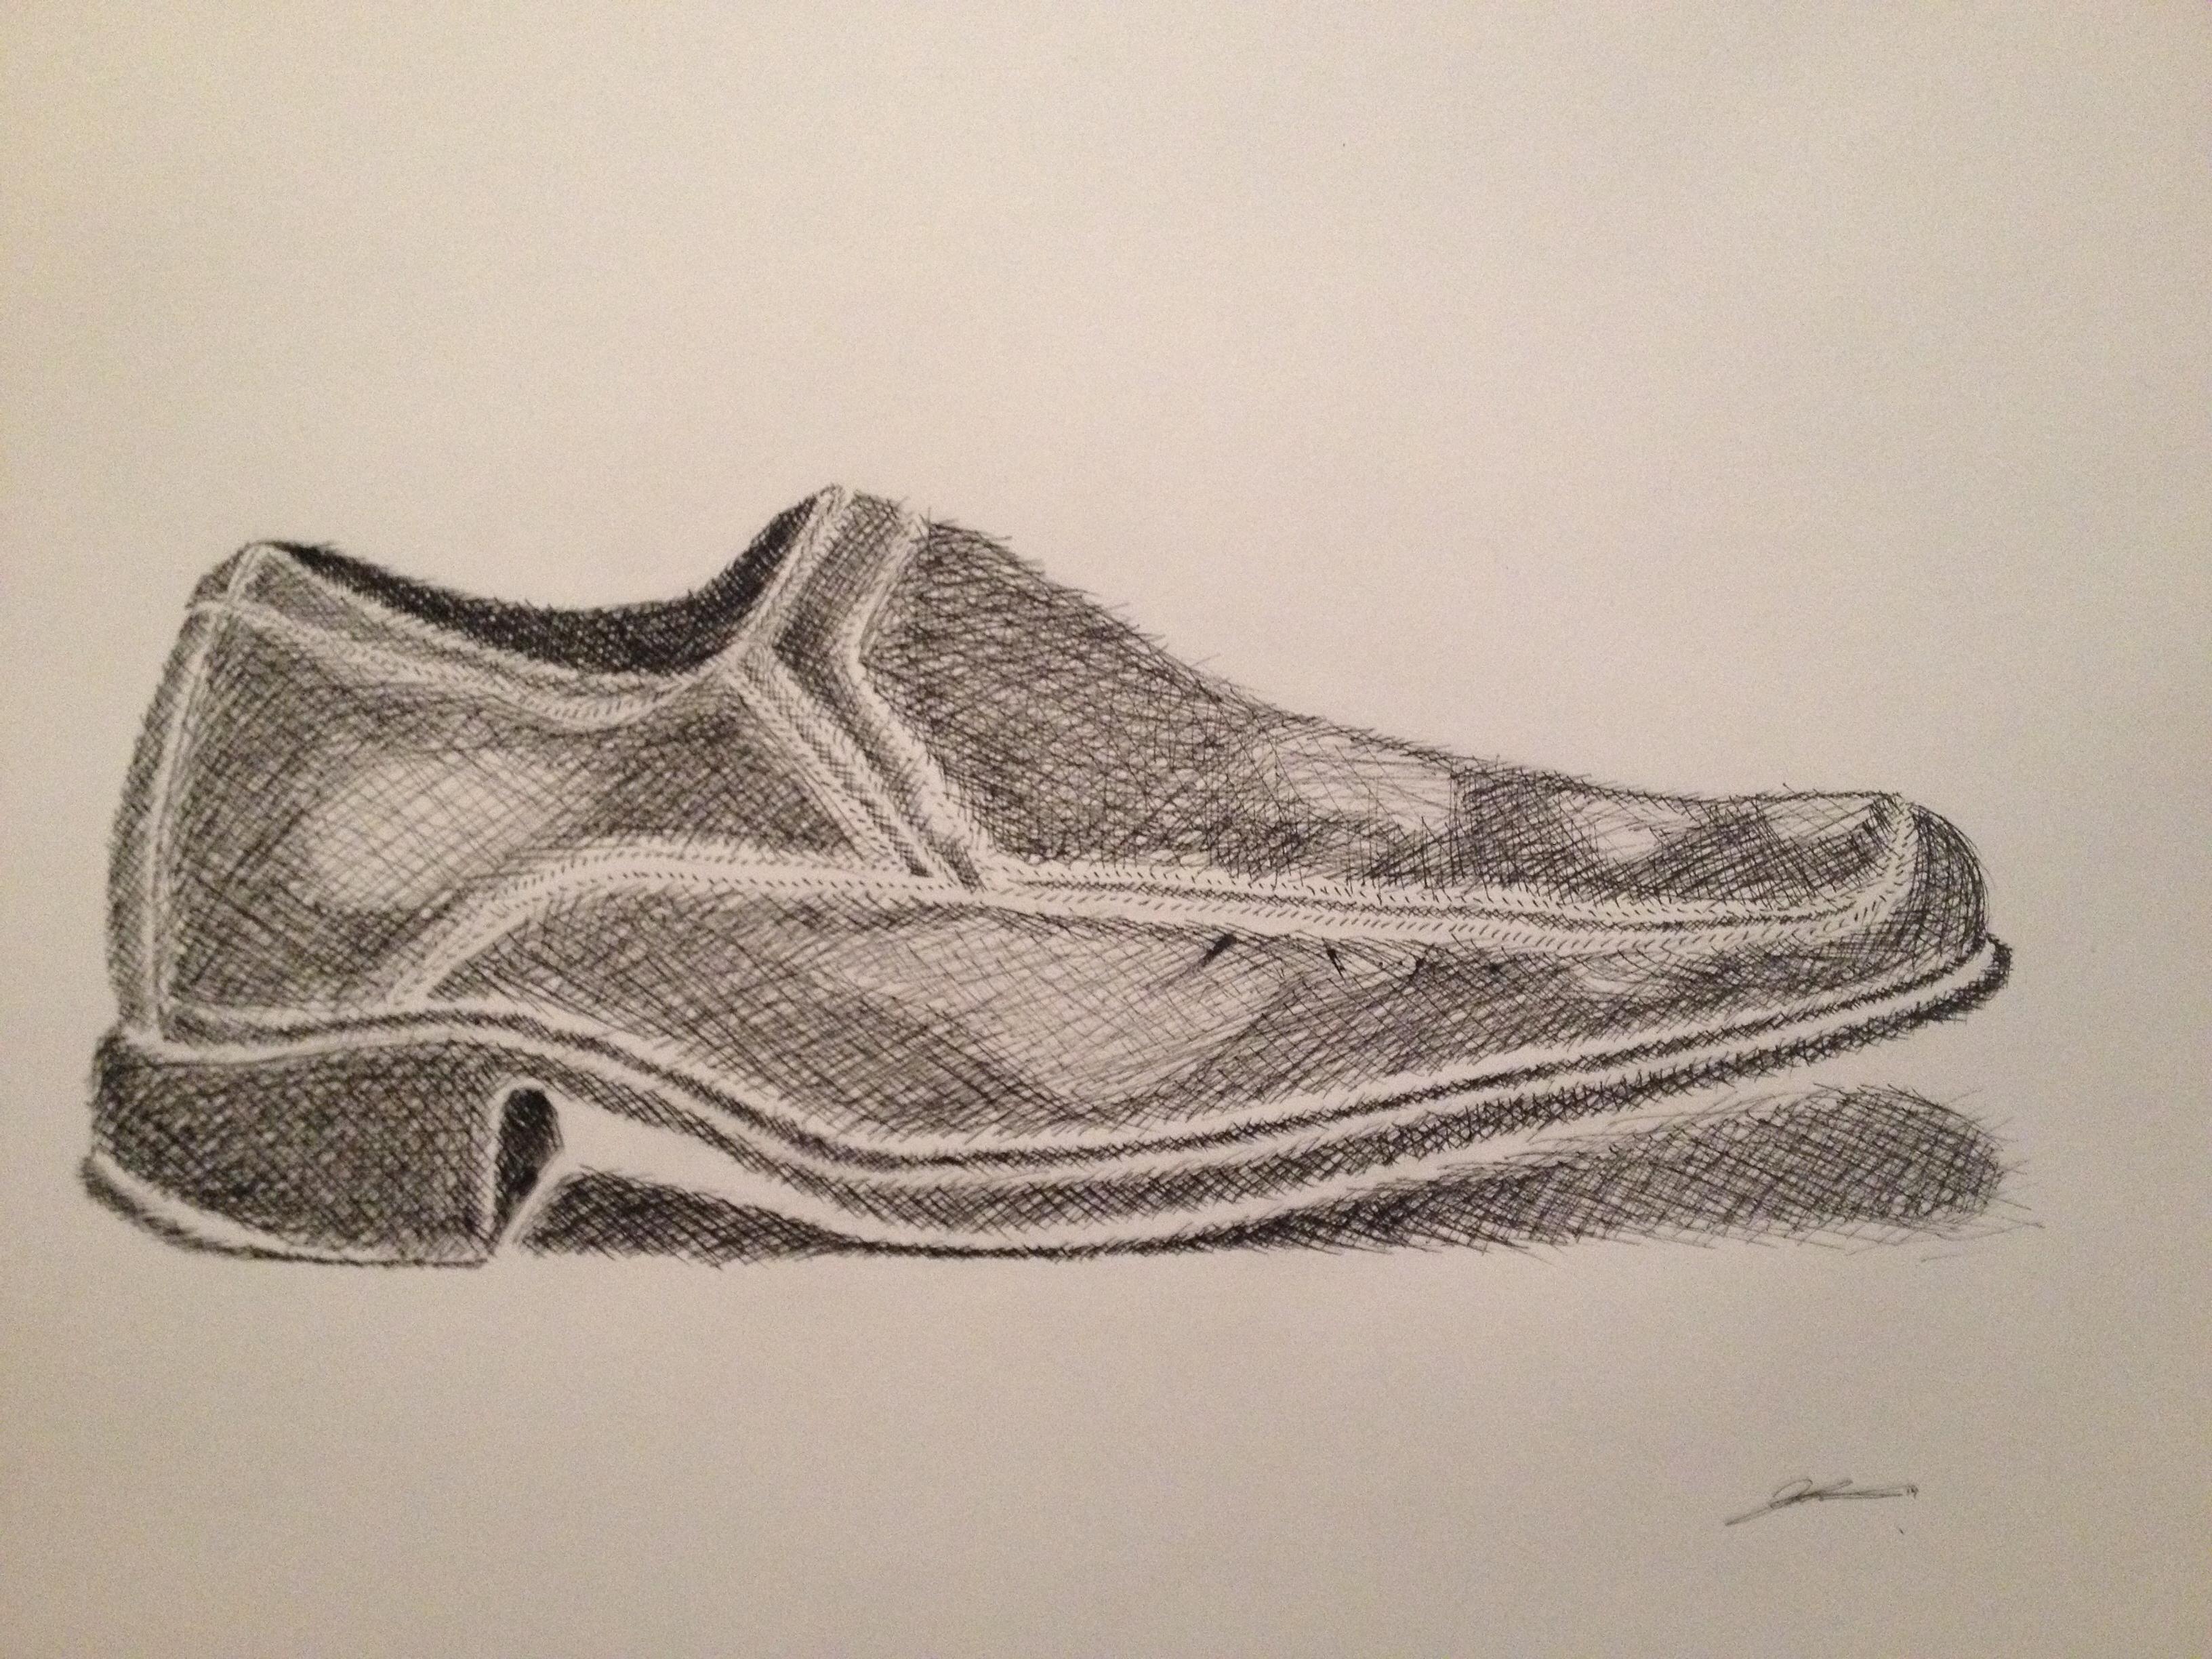 Dress Shoes Drawing at GetDrawings.com